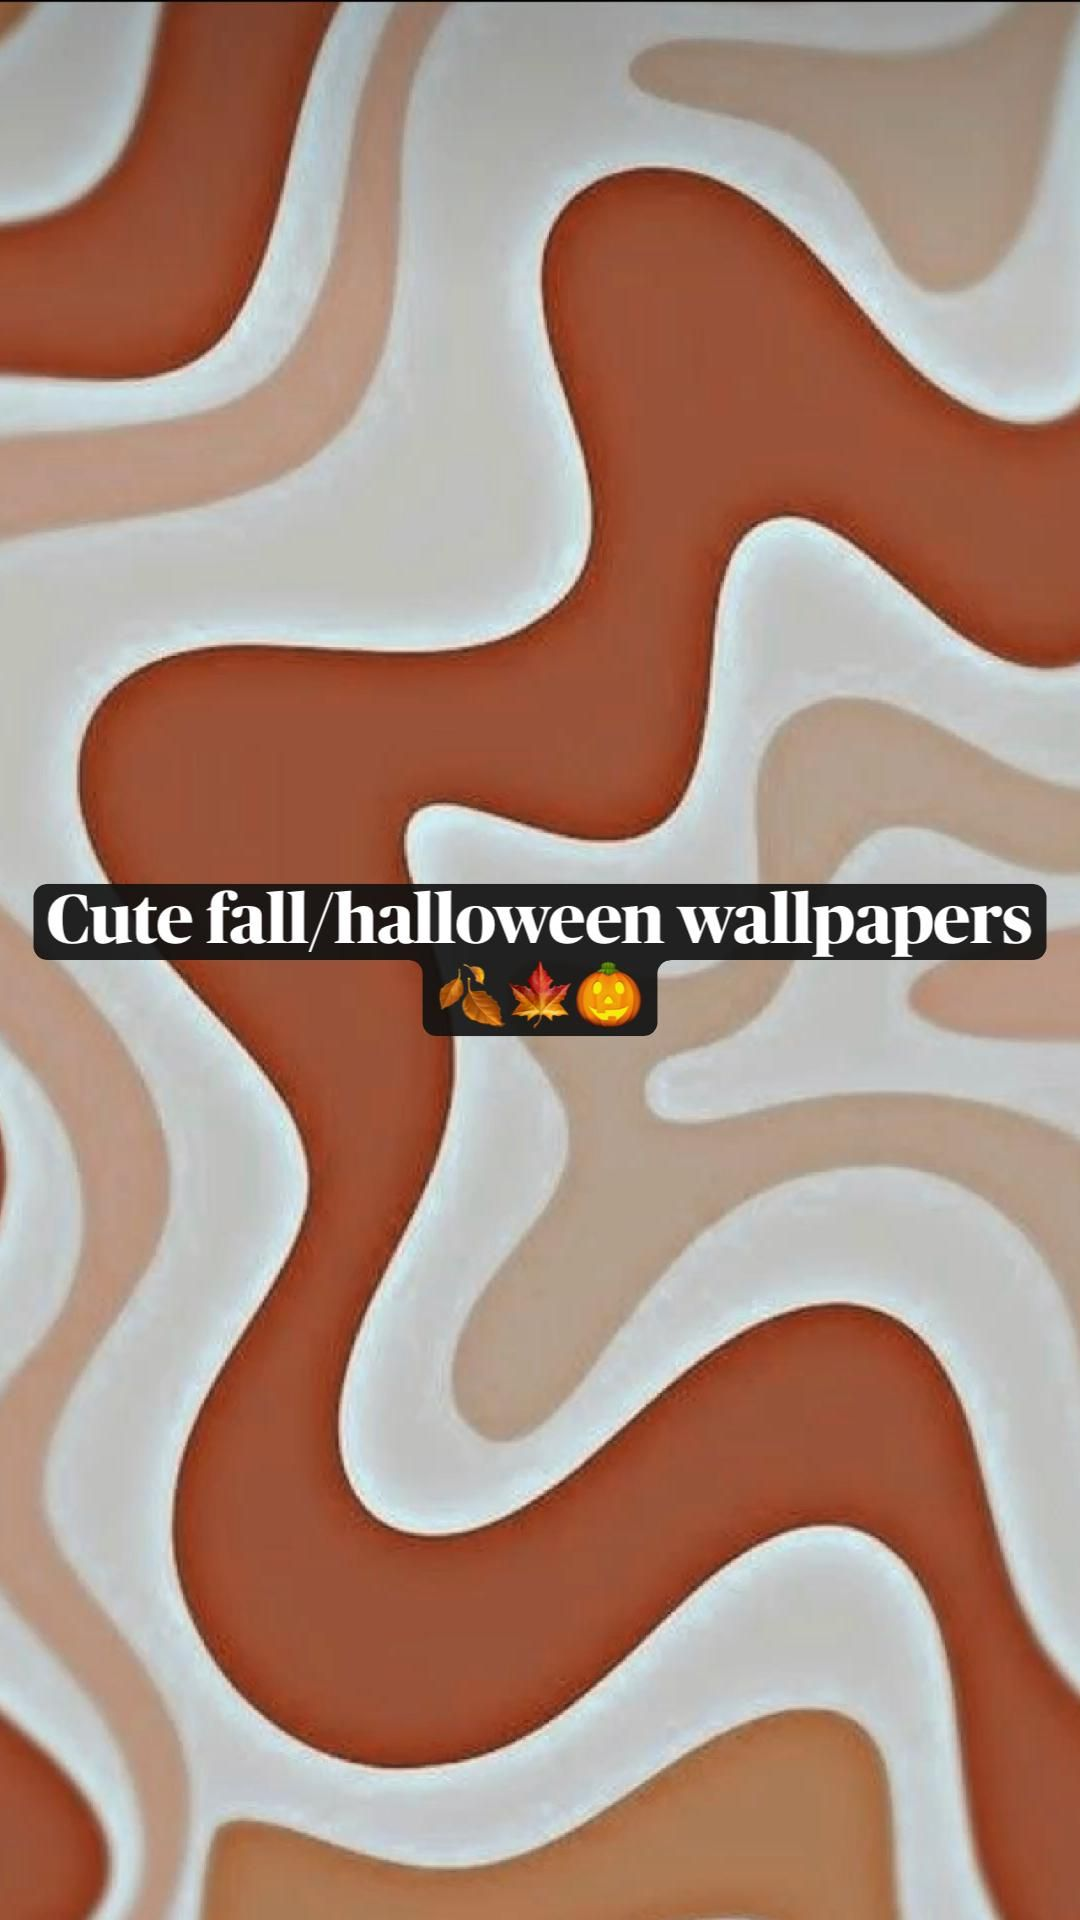 Cute fall/halloween wallpapers 🍂🍁🎃